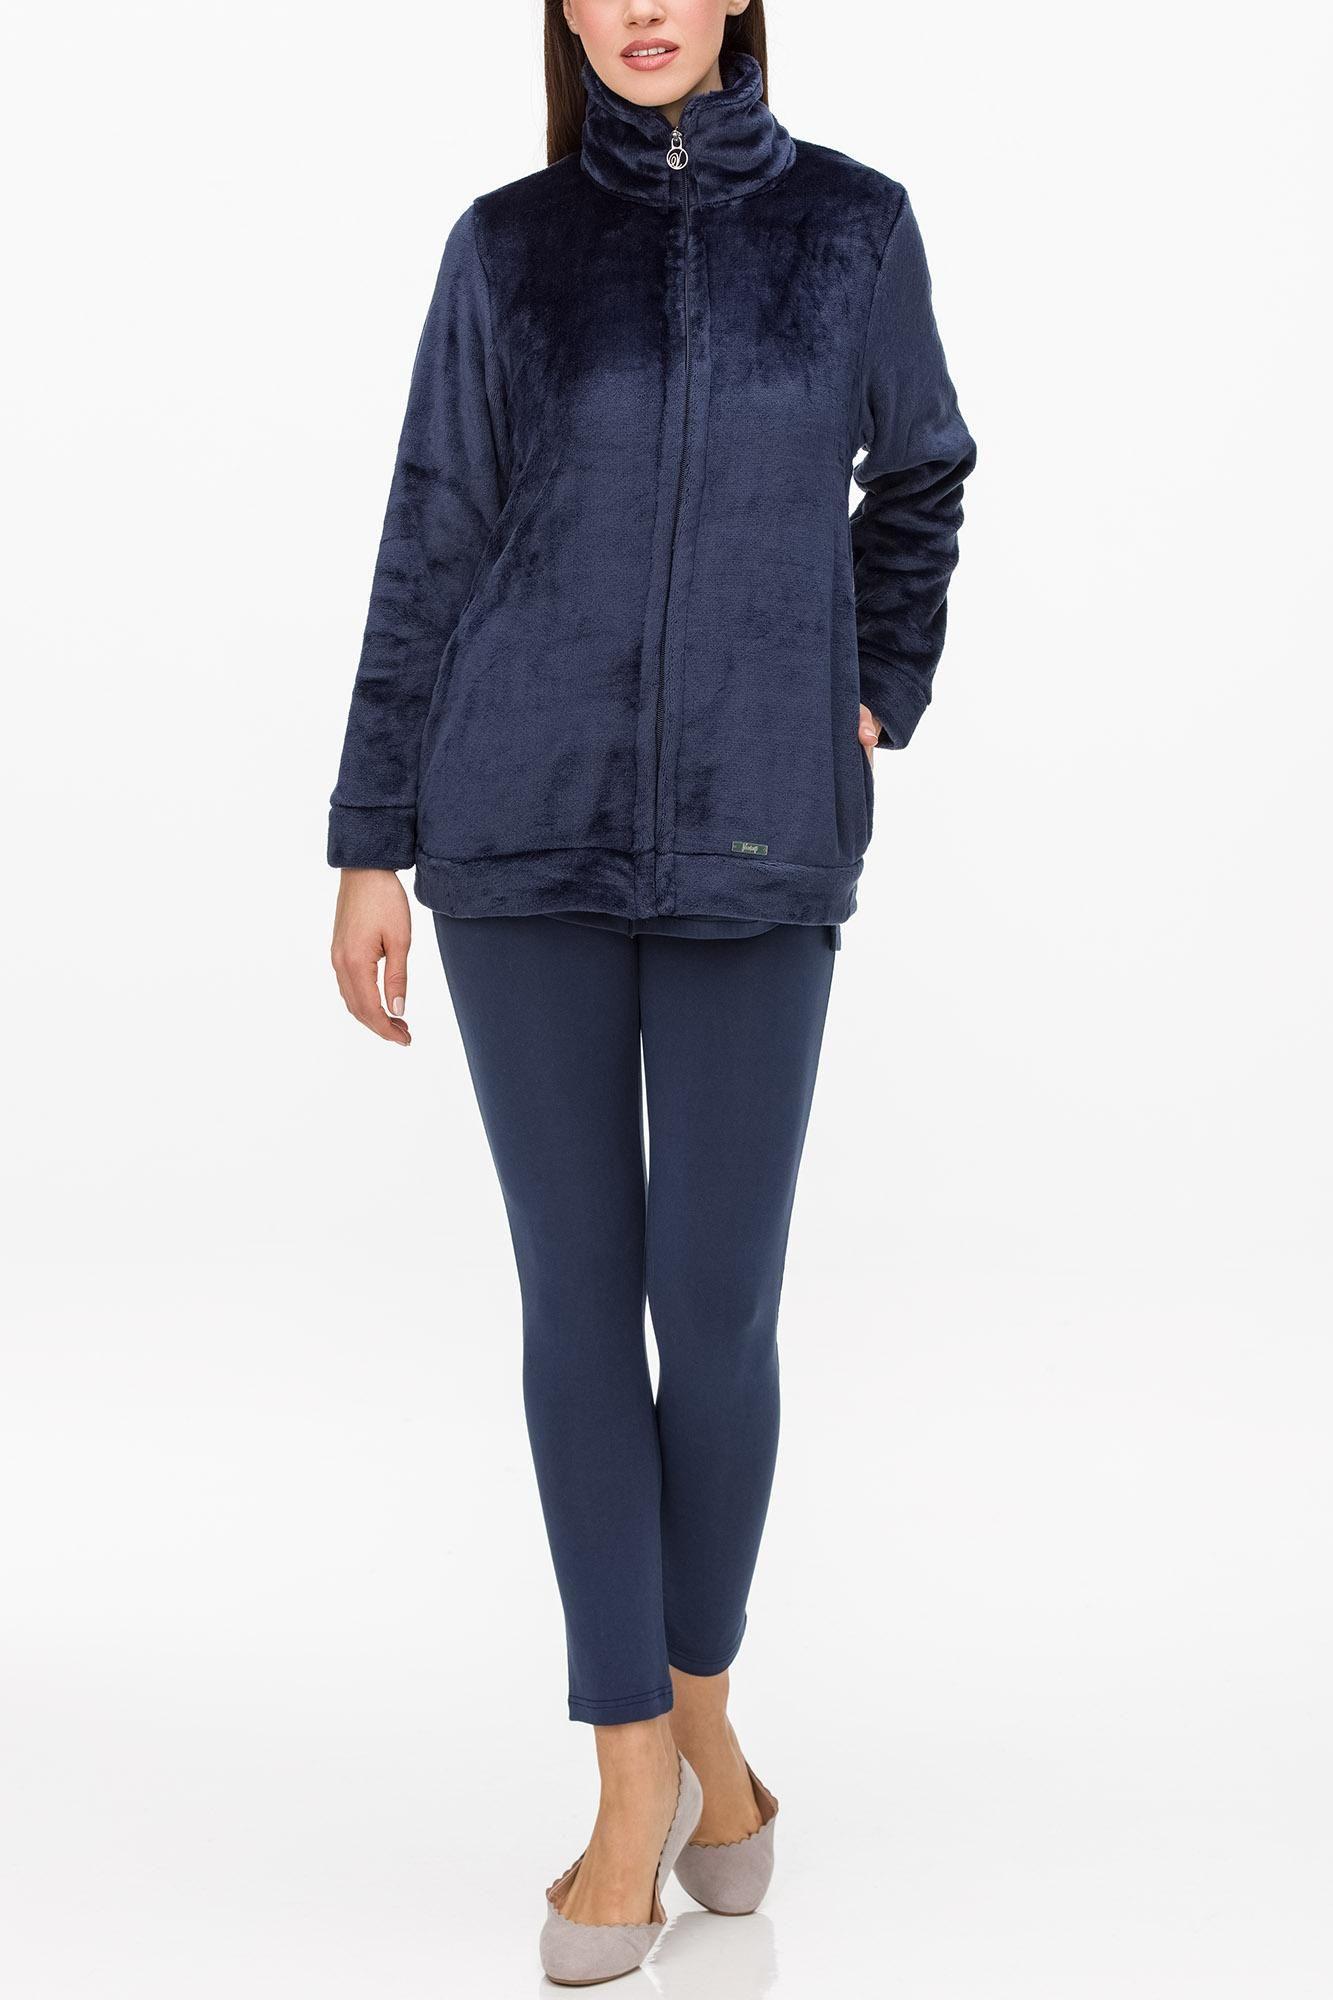 Women's Zipped Fleece Jacket